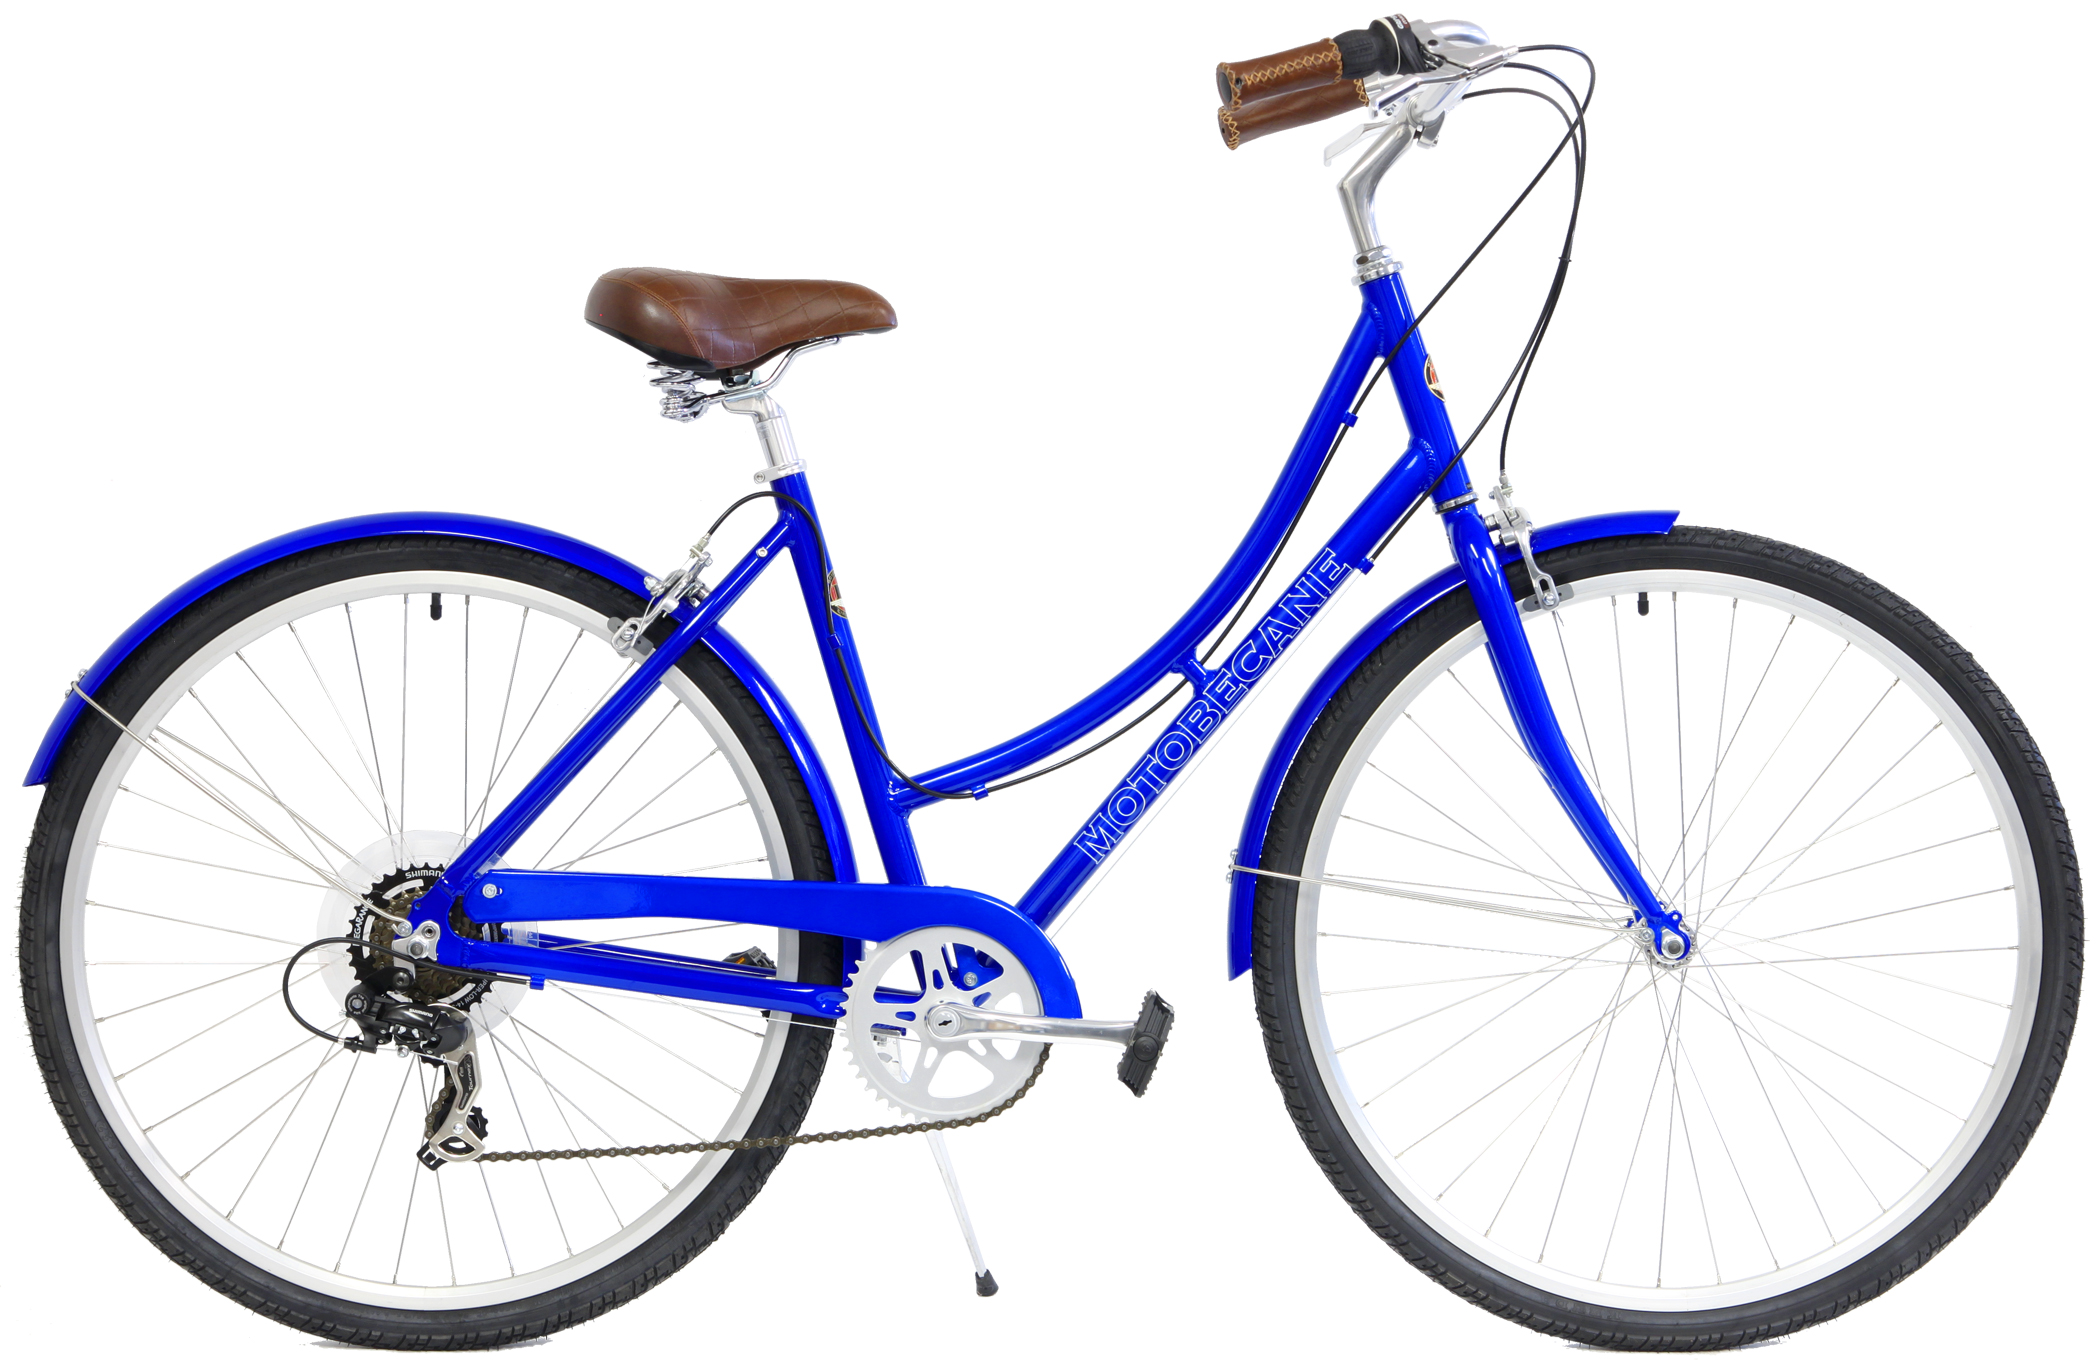 City Bikes Save up to 60% off new Motobecane Bistro 7V Aluminum City ...